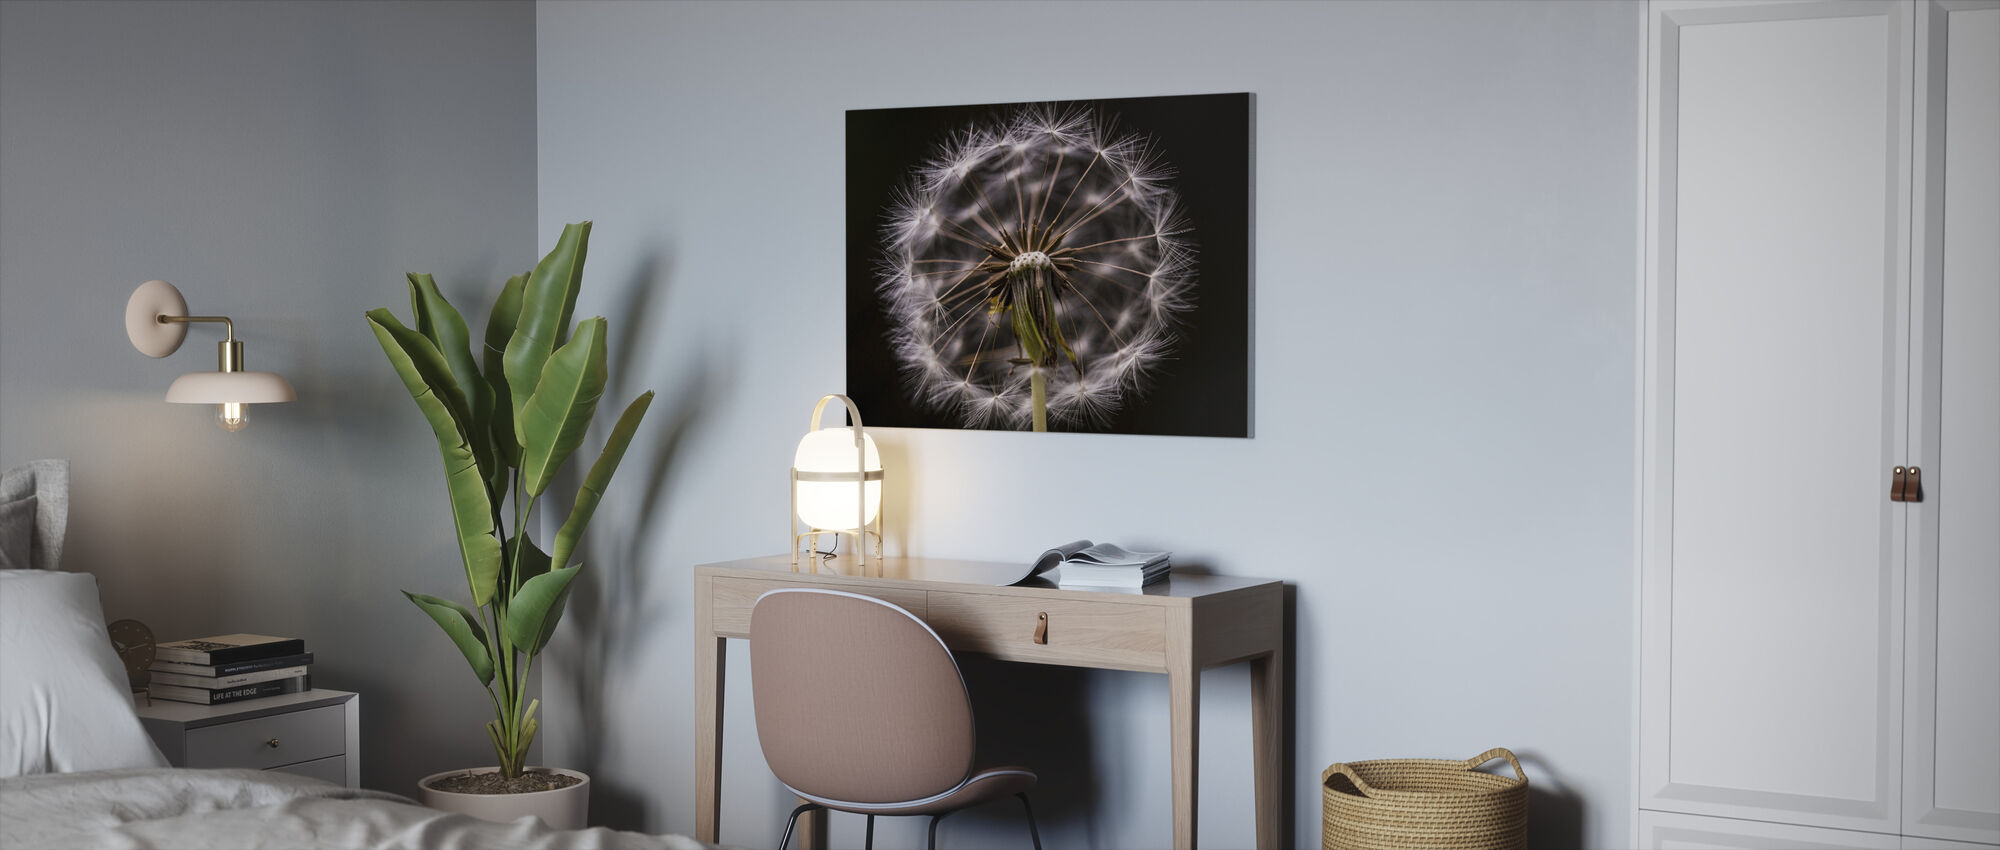 Freaky flower - Canvas print - Office